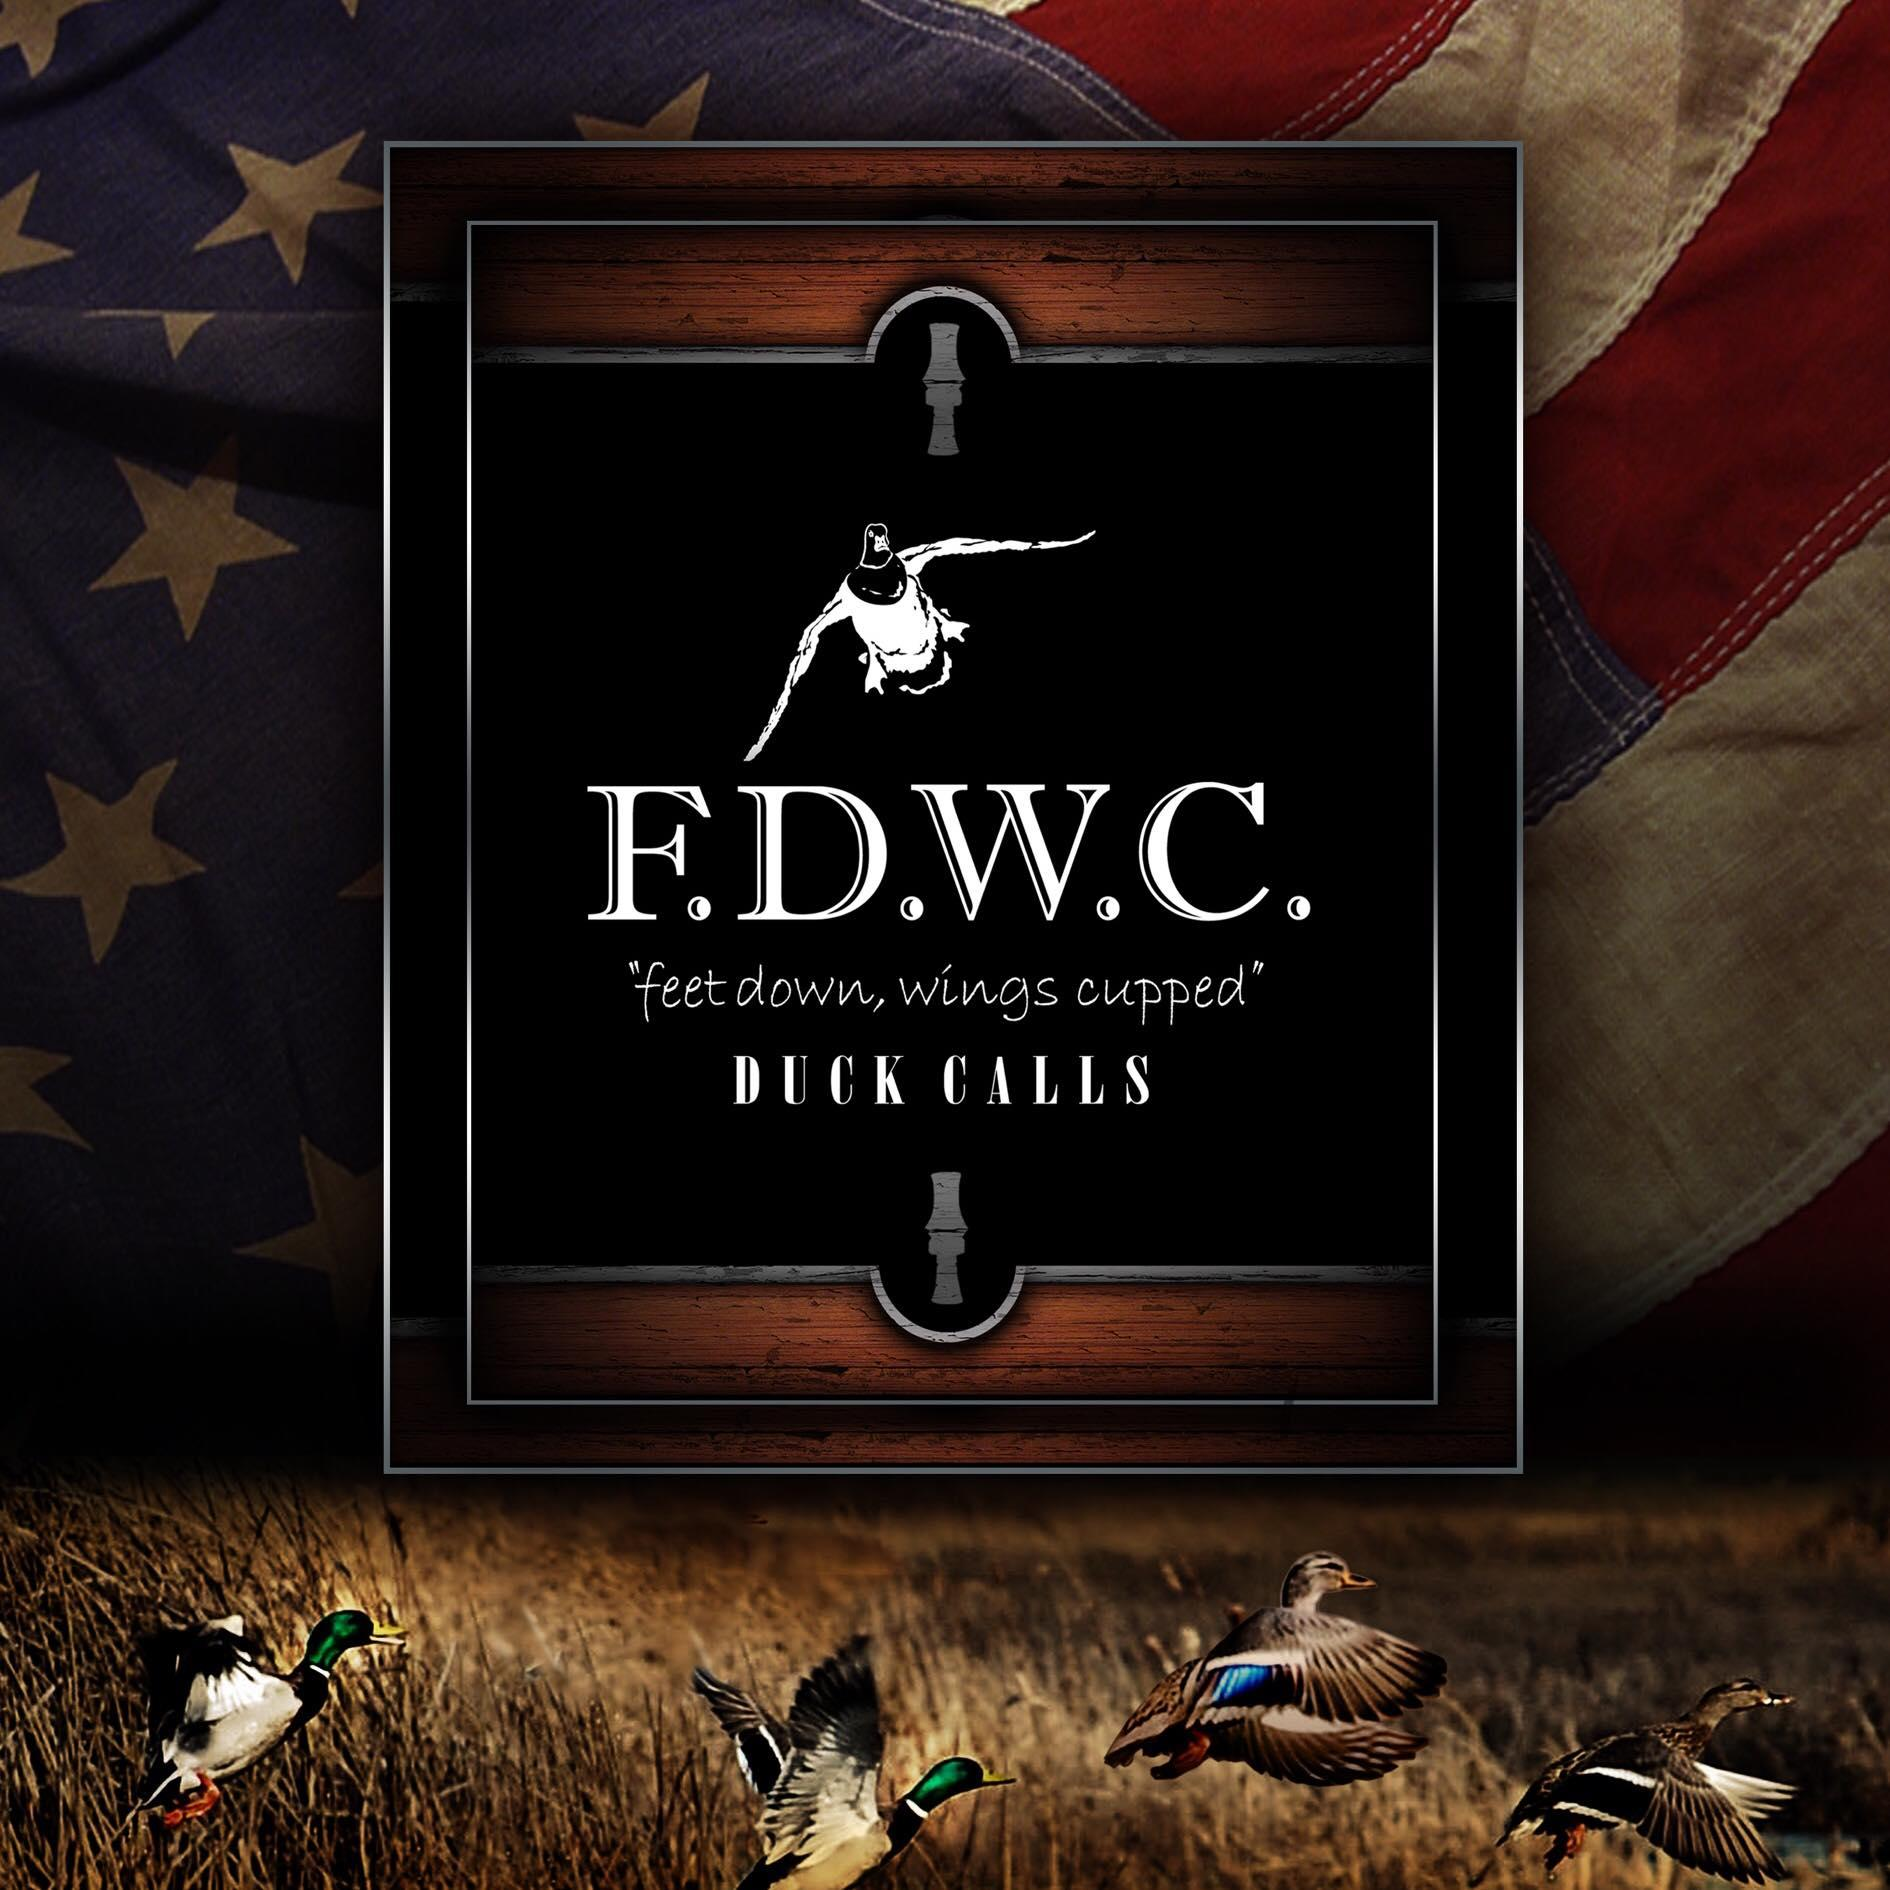 F.D.W.C Duck Calls - Arthur City, TX - Sporting Goods Stores